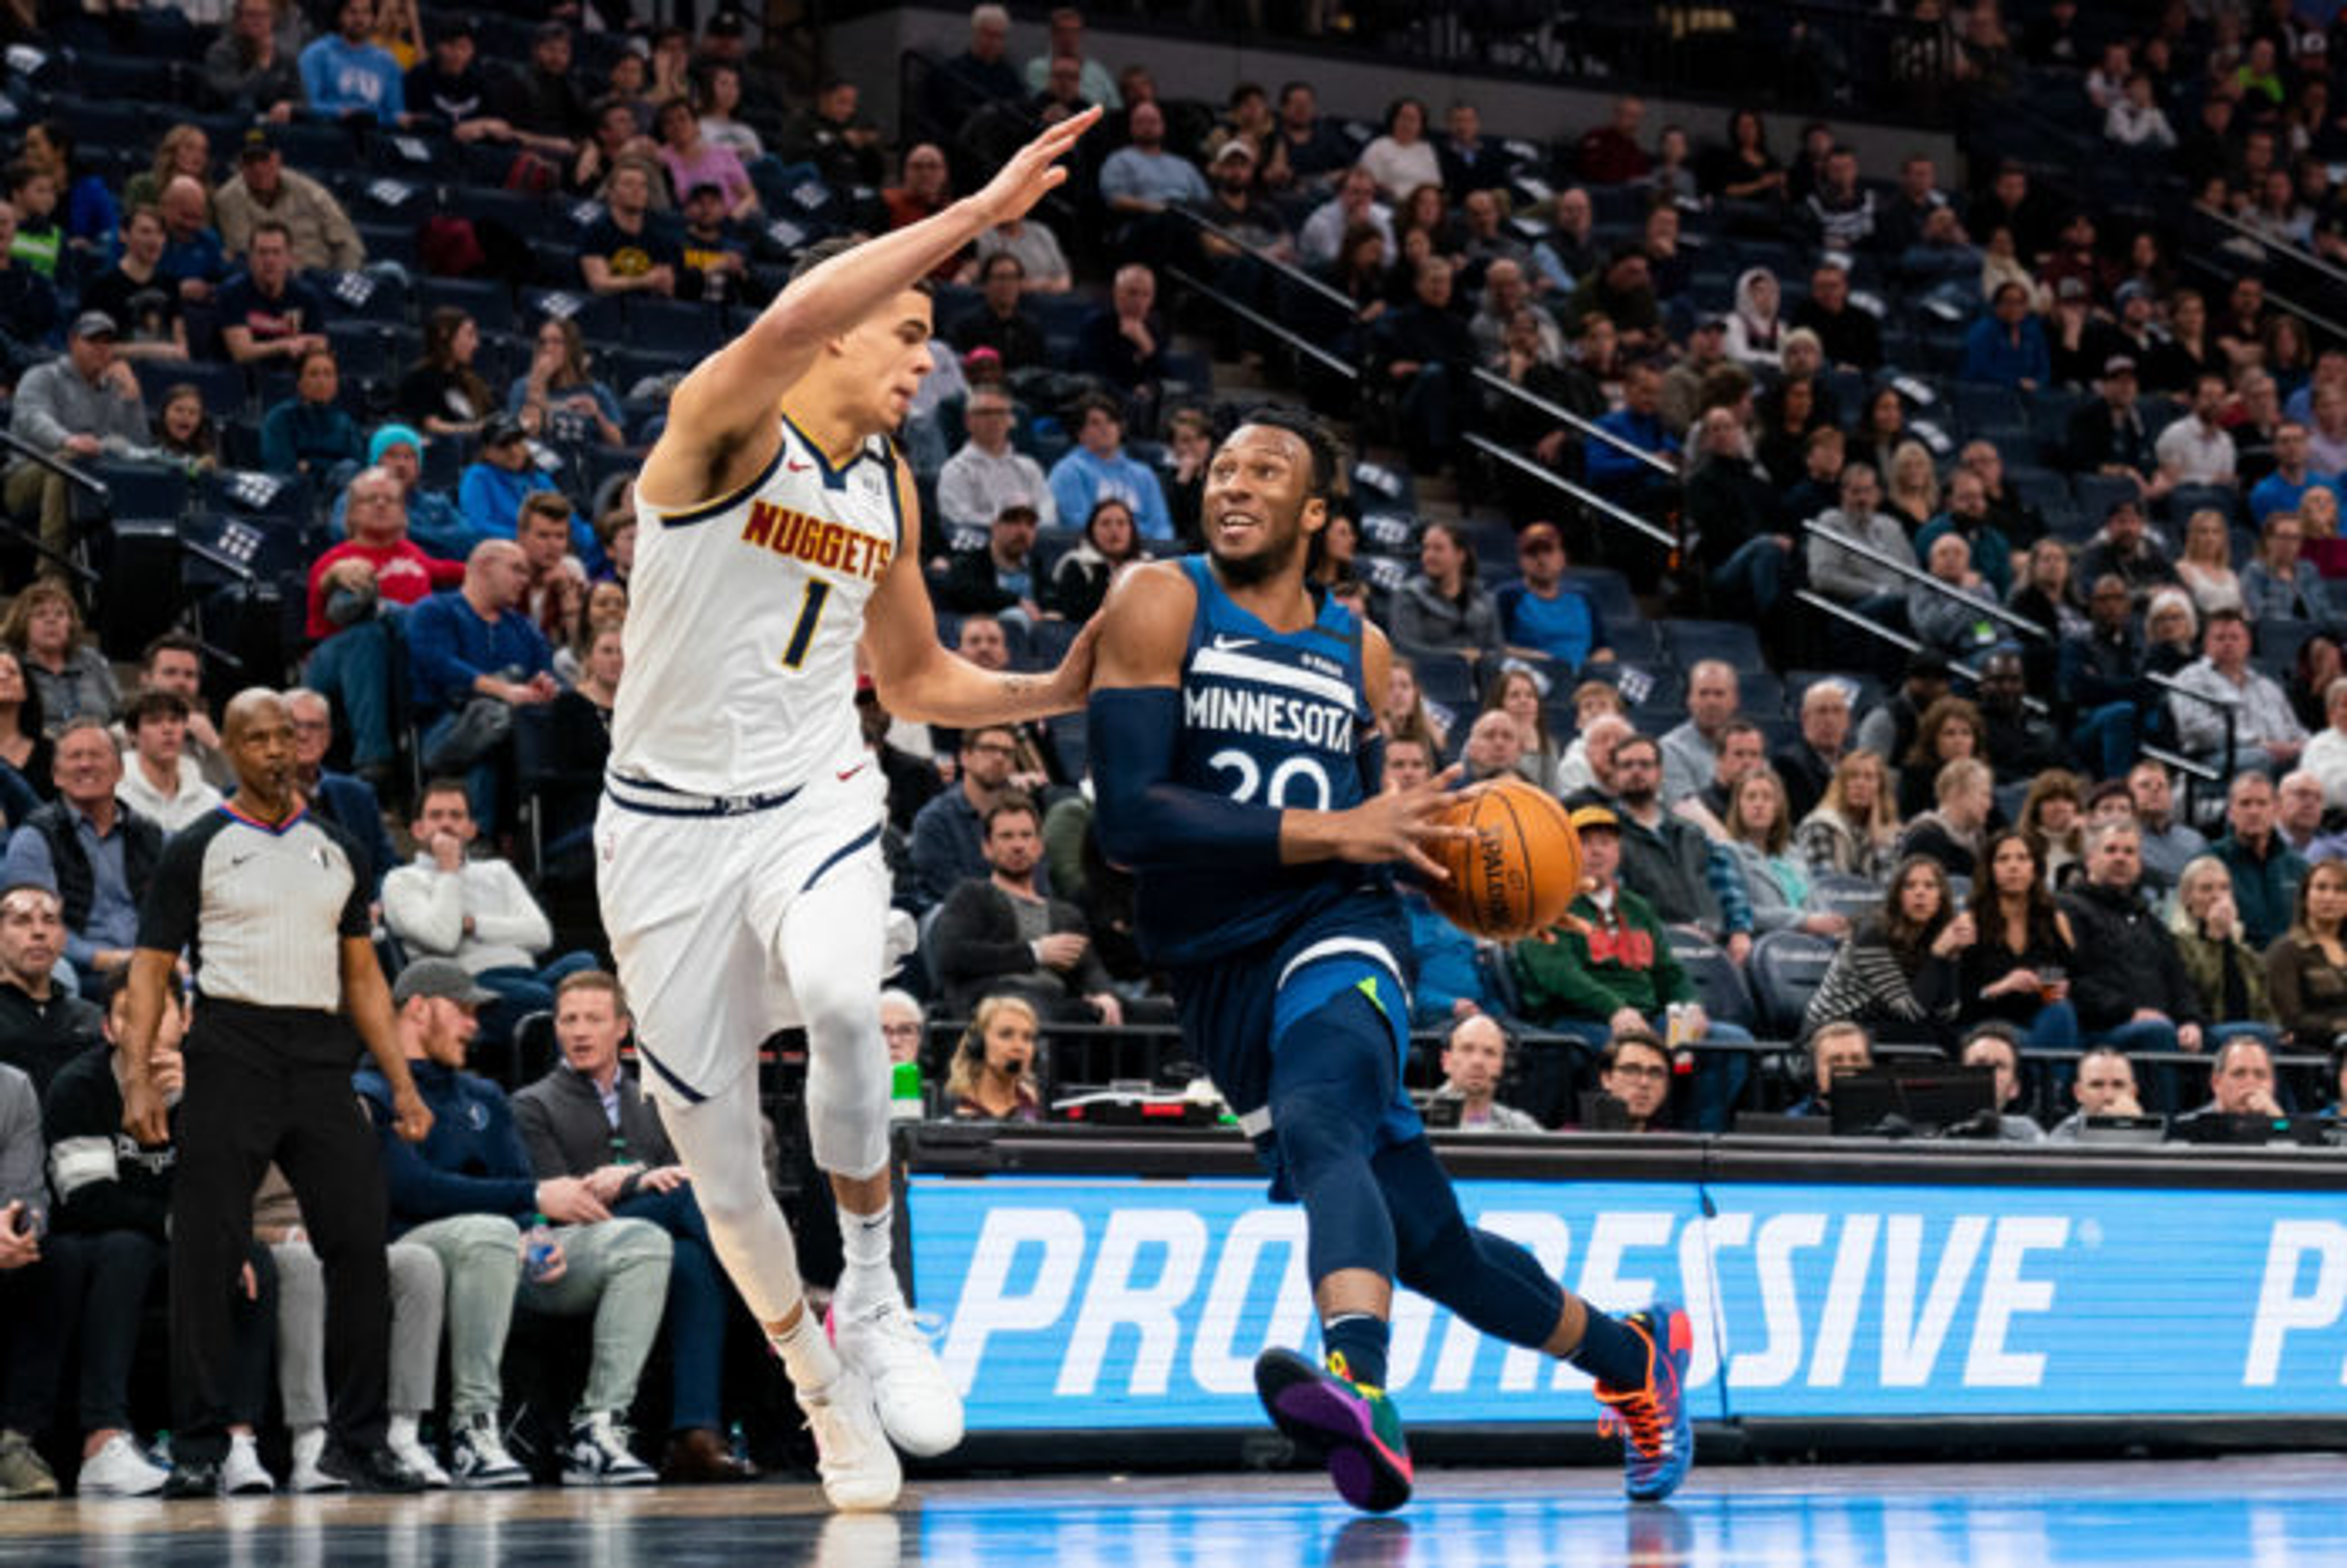 Minnesota Timberwolves guard Josh Okogie (20) dribbles in the third quarter against Denver Nuggets forward Michael Porter Jr. (1) at Target Center.